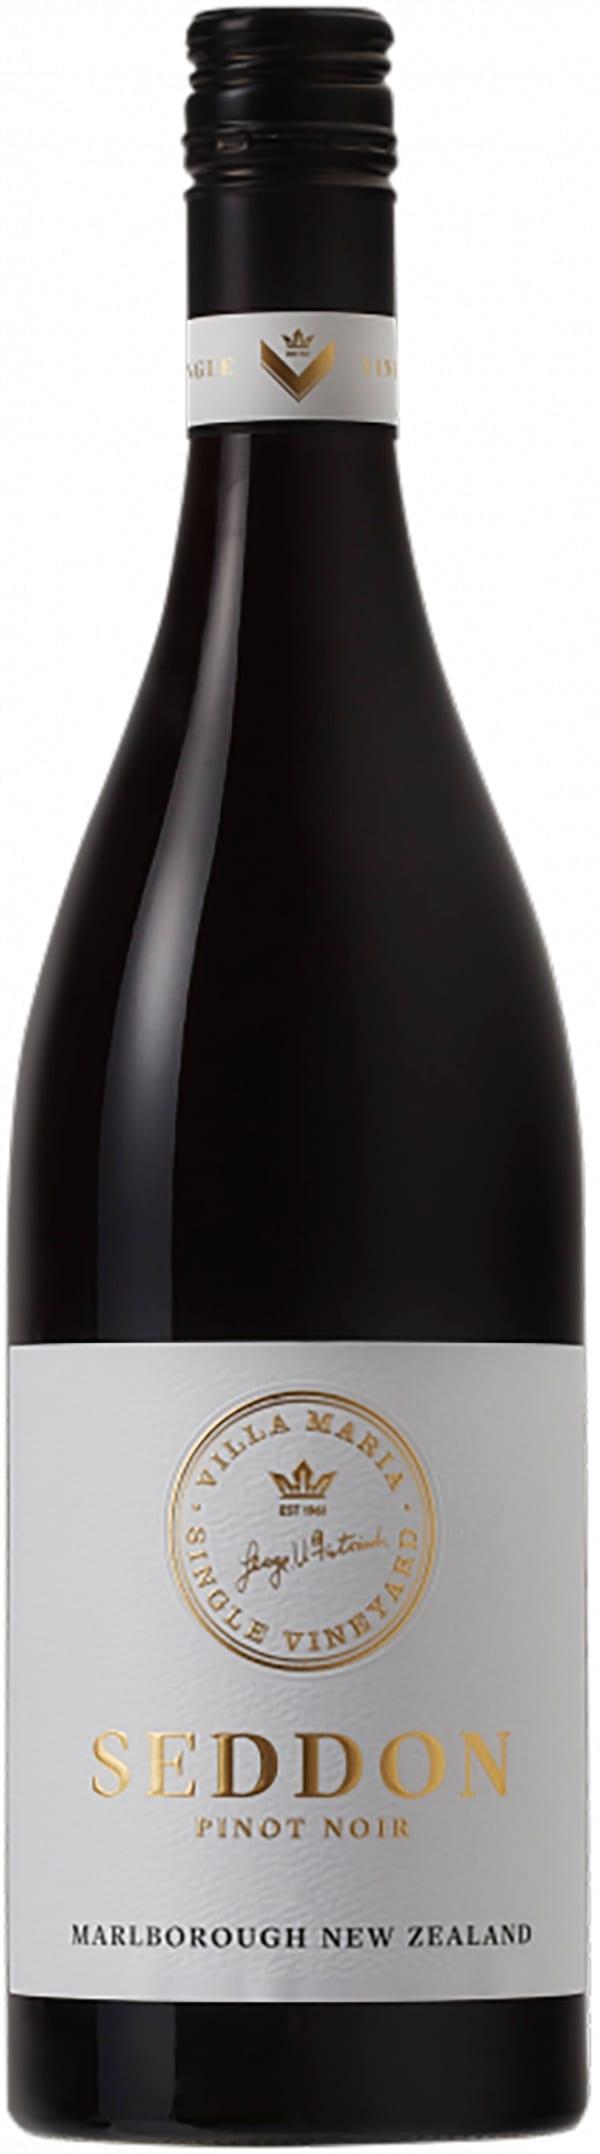 Villa Maria Seddon Vineyard Pinot Noir 2014